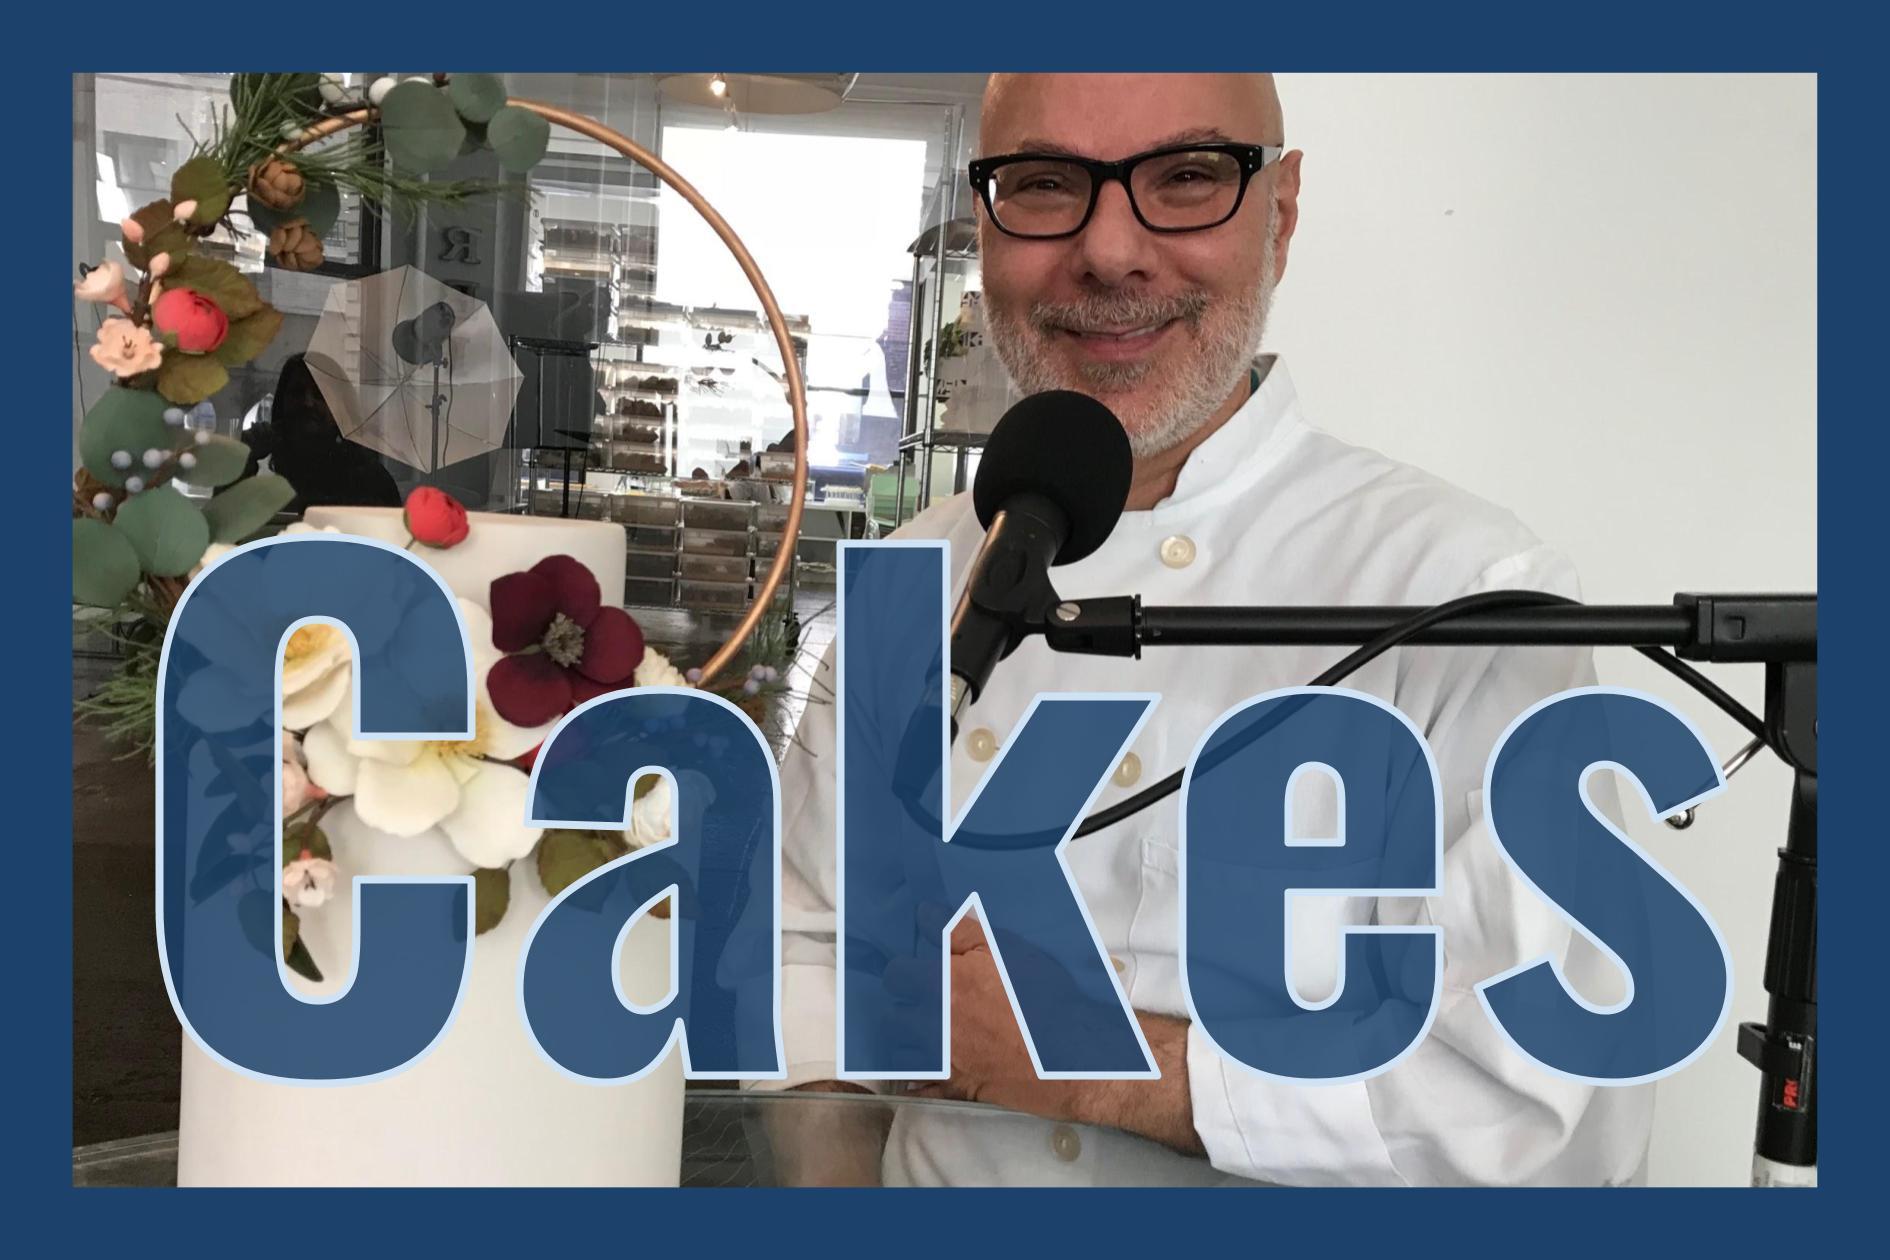 1Party Slate TWB Profile Meme - Cakes